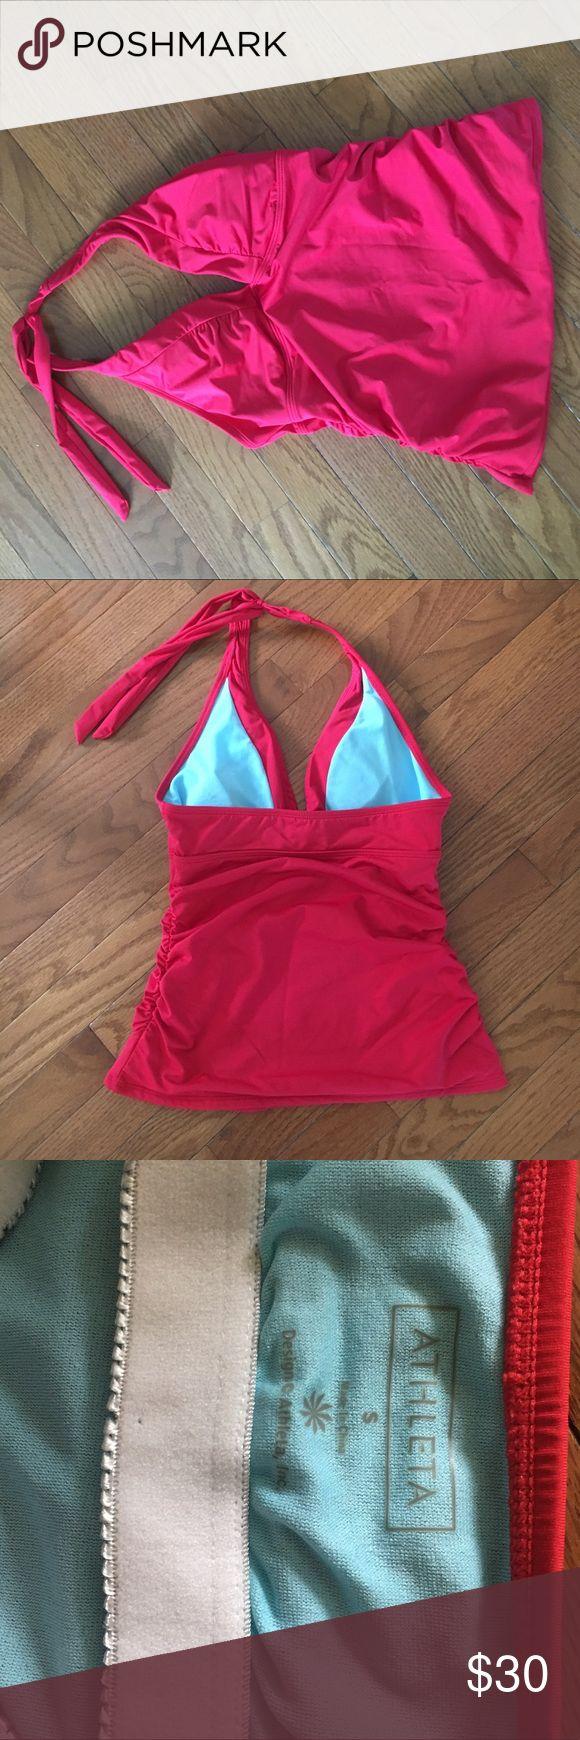 Athleta red tankini top Athleta Shirrendipity Halter Tankini, red with blue lining, side rouching, size Small Athleta Swim